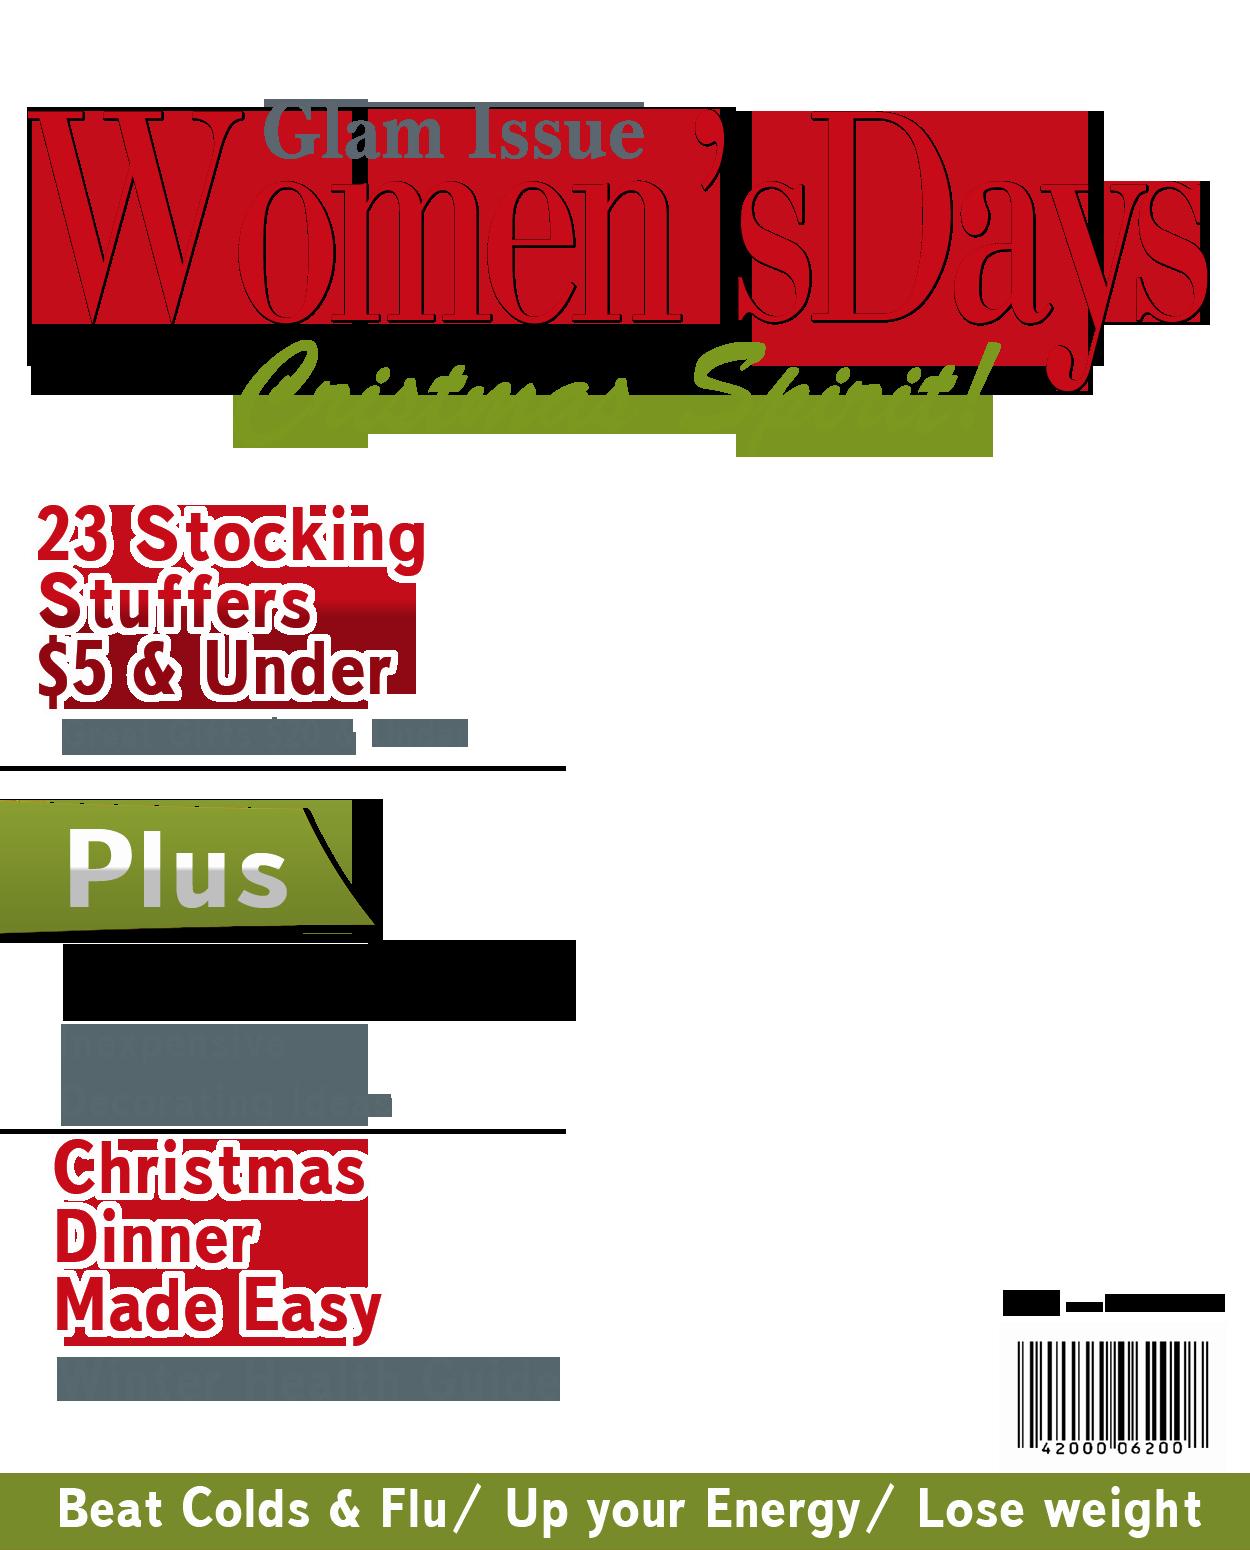 Free Personalized Magazine Covers Templates Elegant Inmagazines Fake Magazine Cover Generator